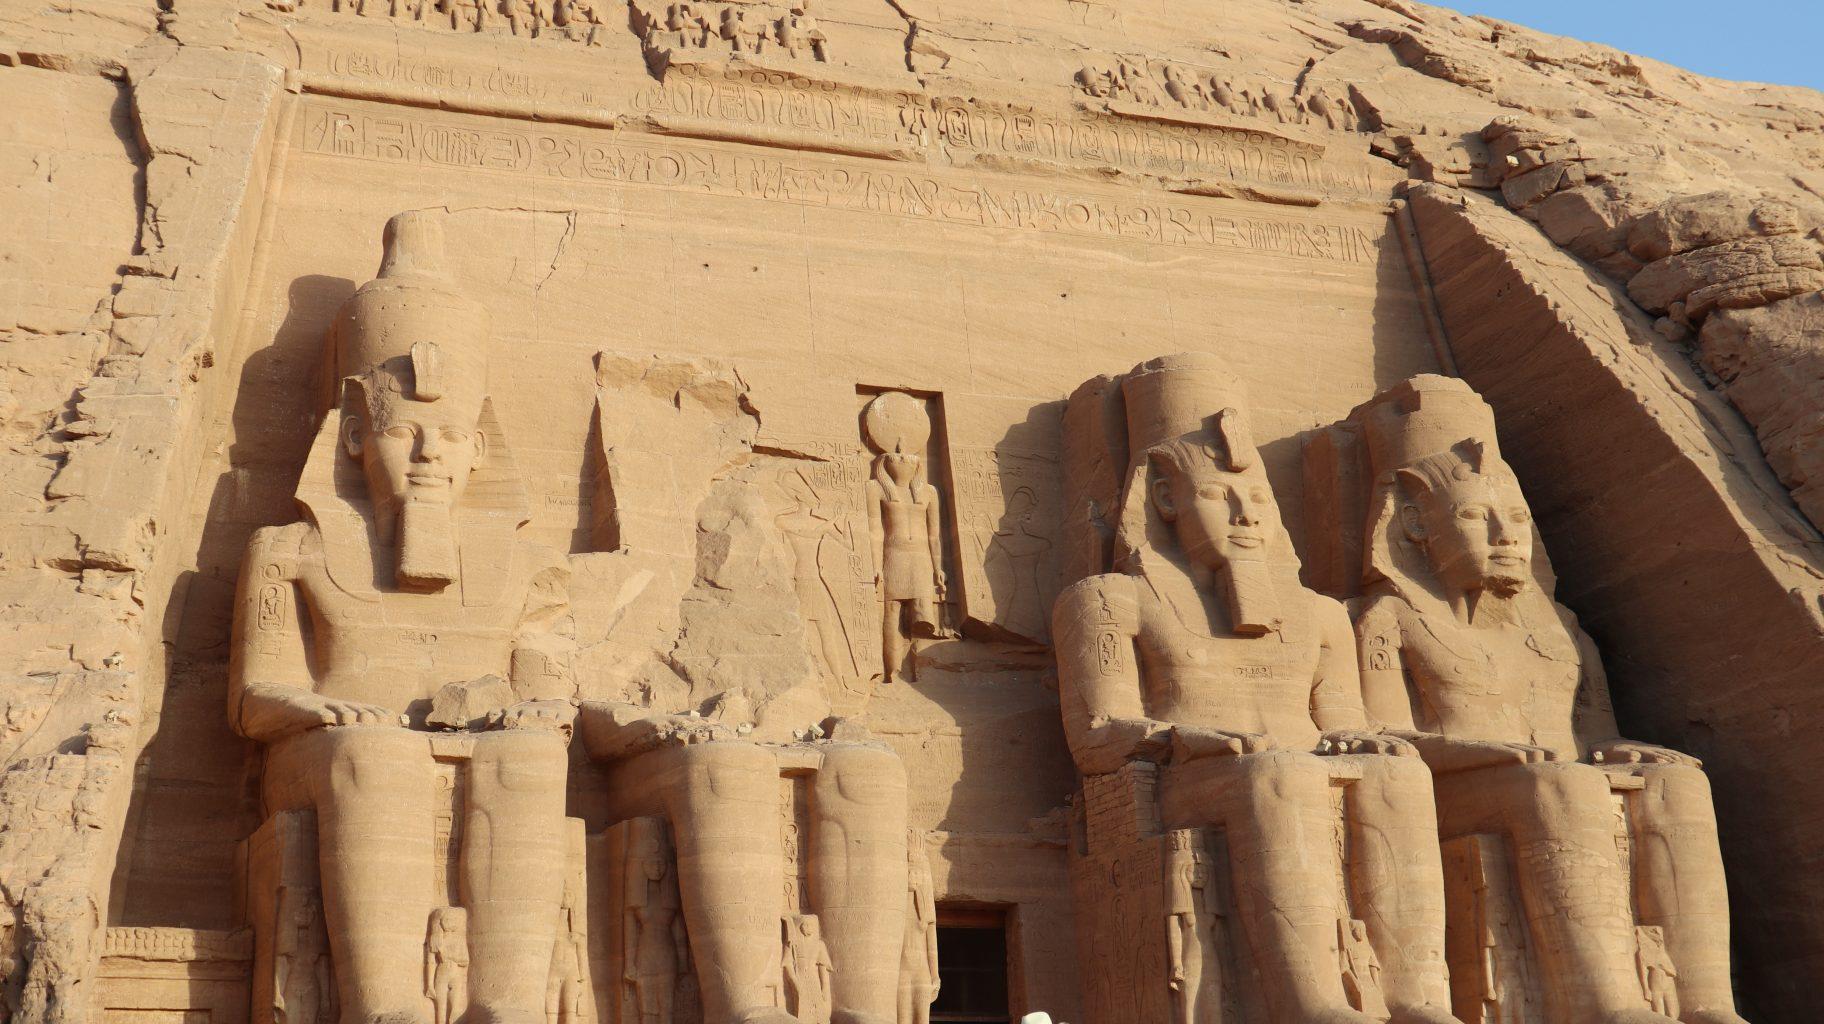 Templo de Ramsés II en Abu Simbel. ¿Es seguro viajar a Egipto?